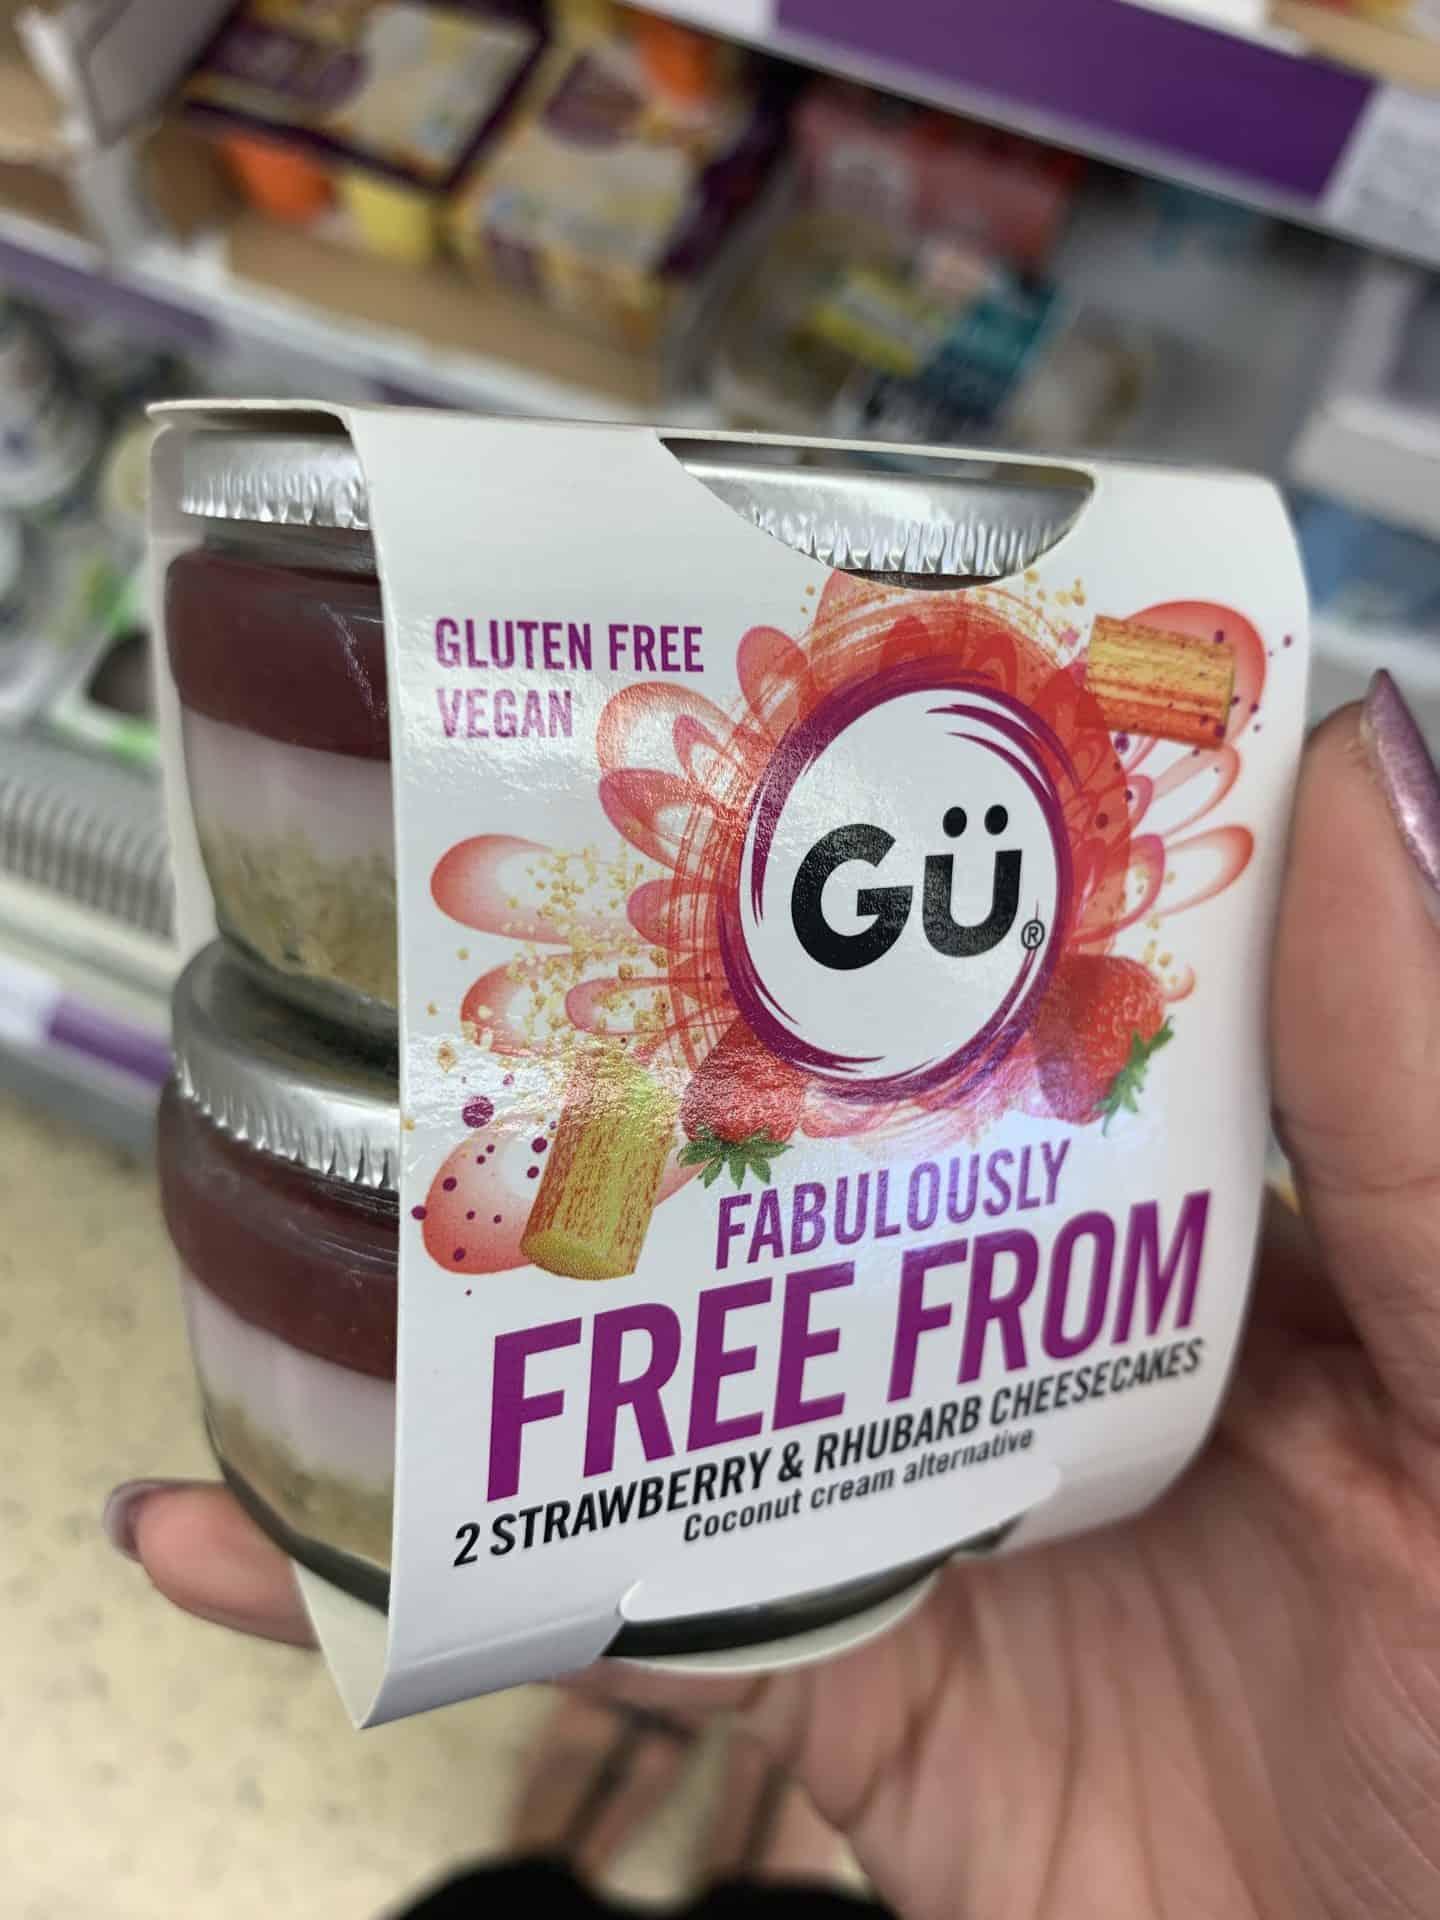 gu gluten free vegan puddings